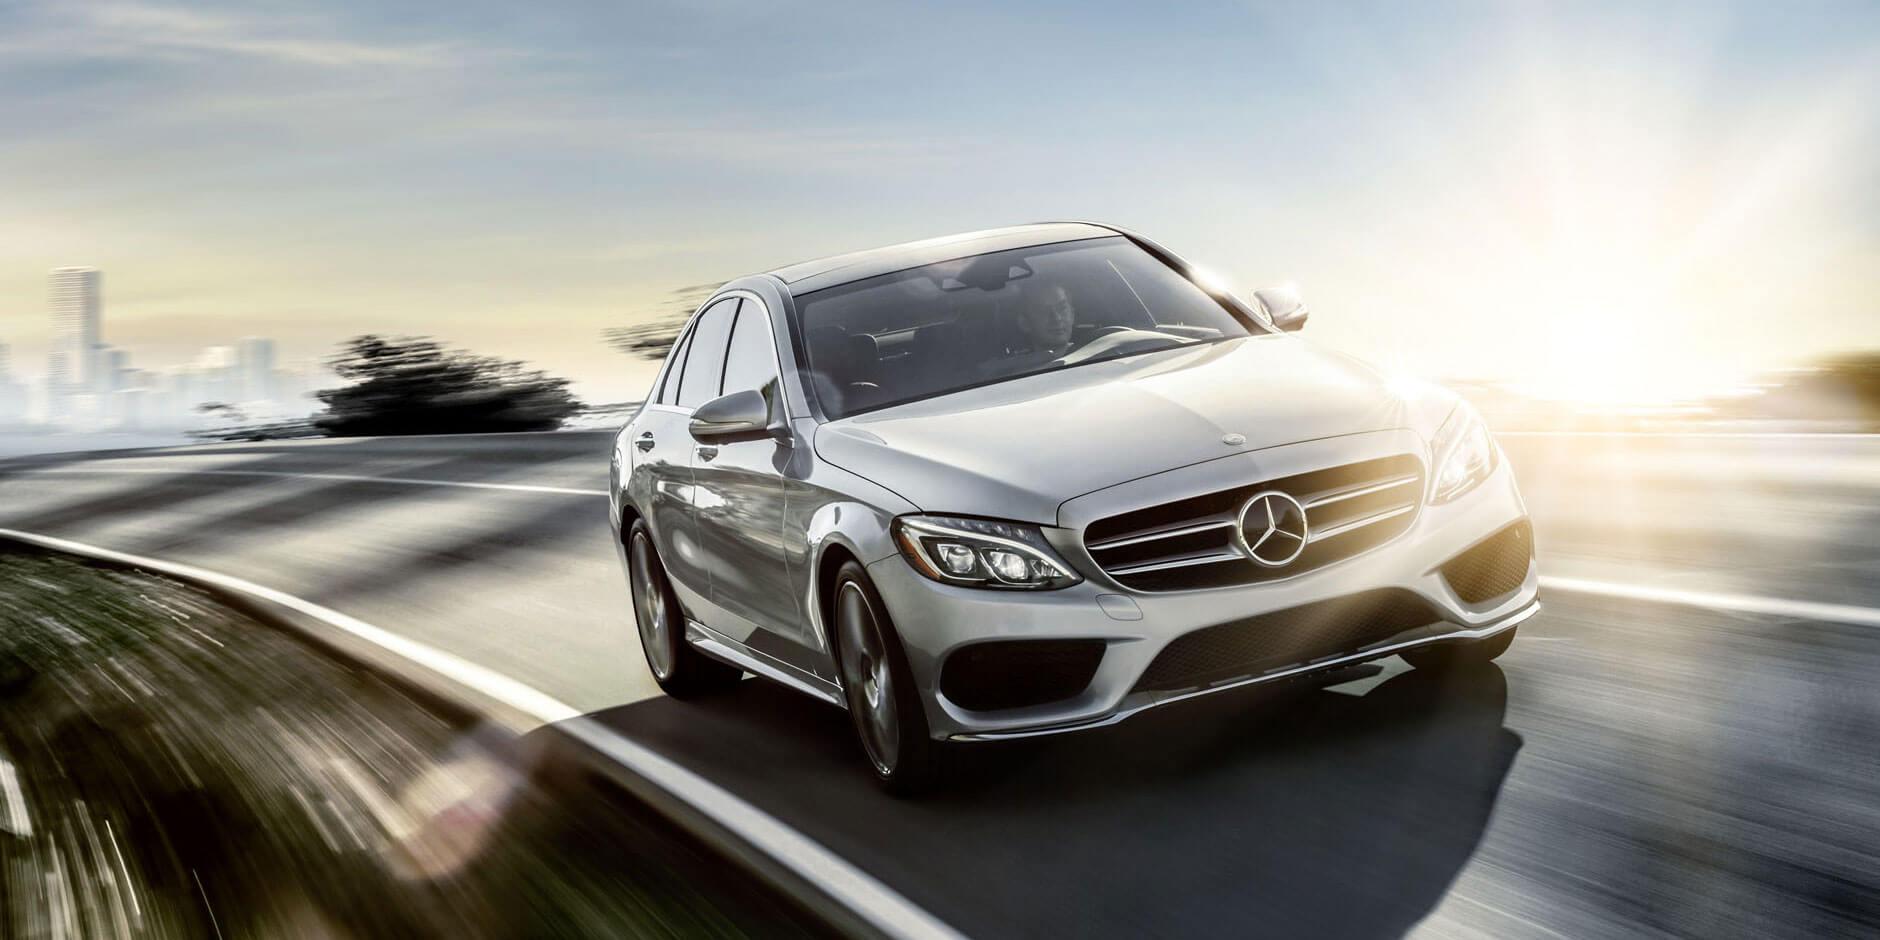 2017 Mercedes-Benz C-Class Front View